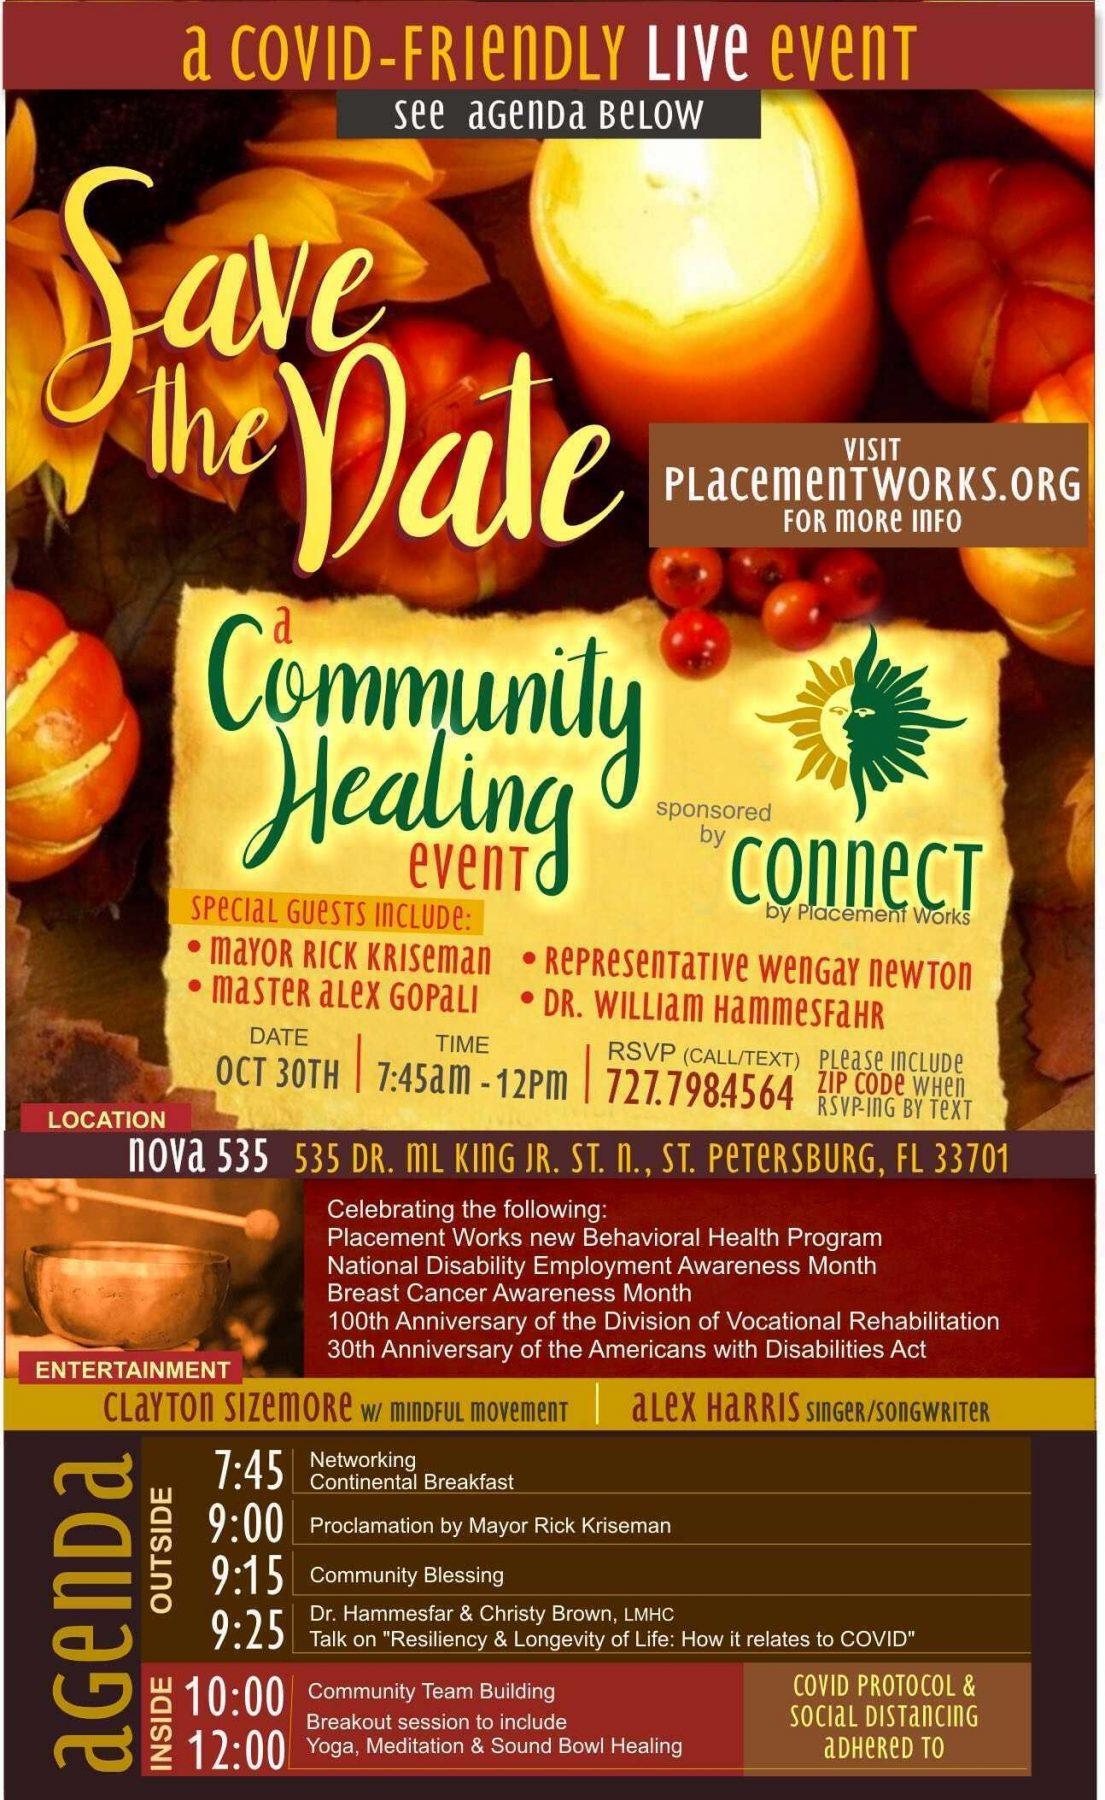 2020 10-30 PlacementWorks Community Healing Event at downtown St. Pete Venue NOVA 535